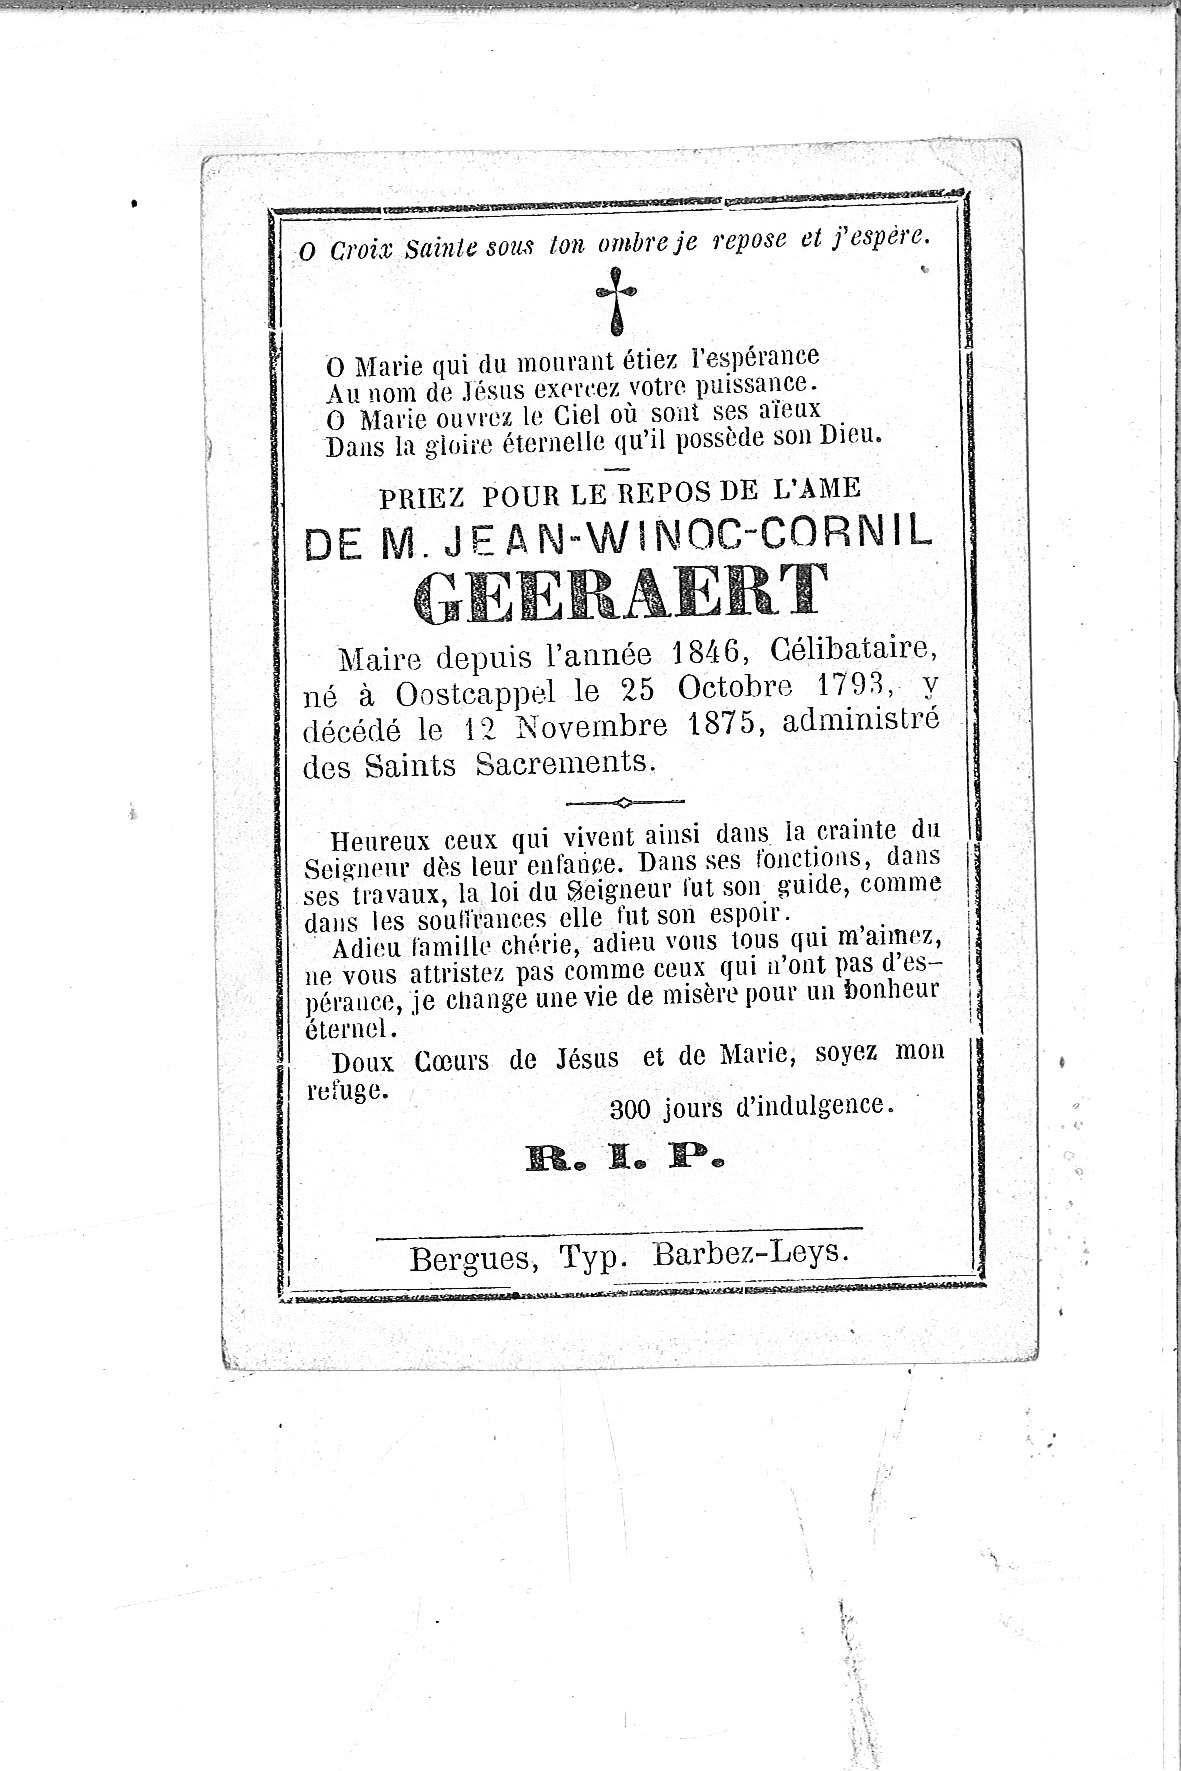 Jean-Winoc-Cornil(1875)20130820111714_00011.jpg